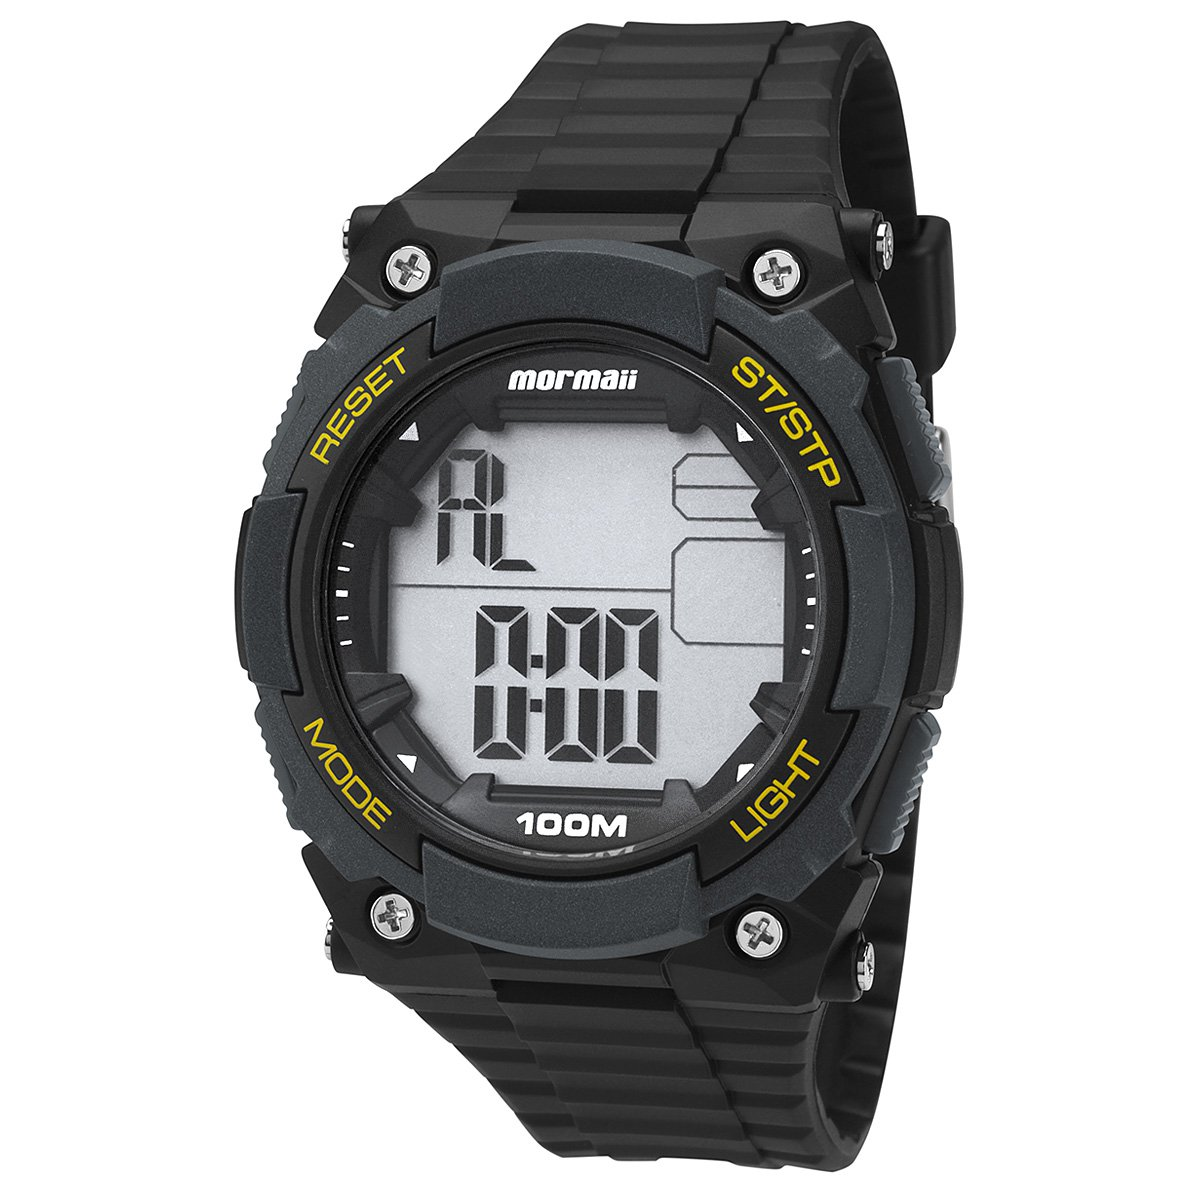 Relógio MOY15518 Mormaii - Compre Agora   Netshoes 7bb8f6f5d2